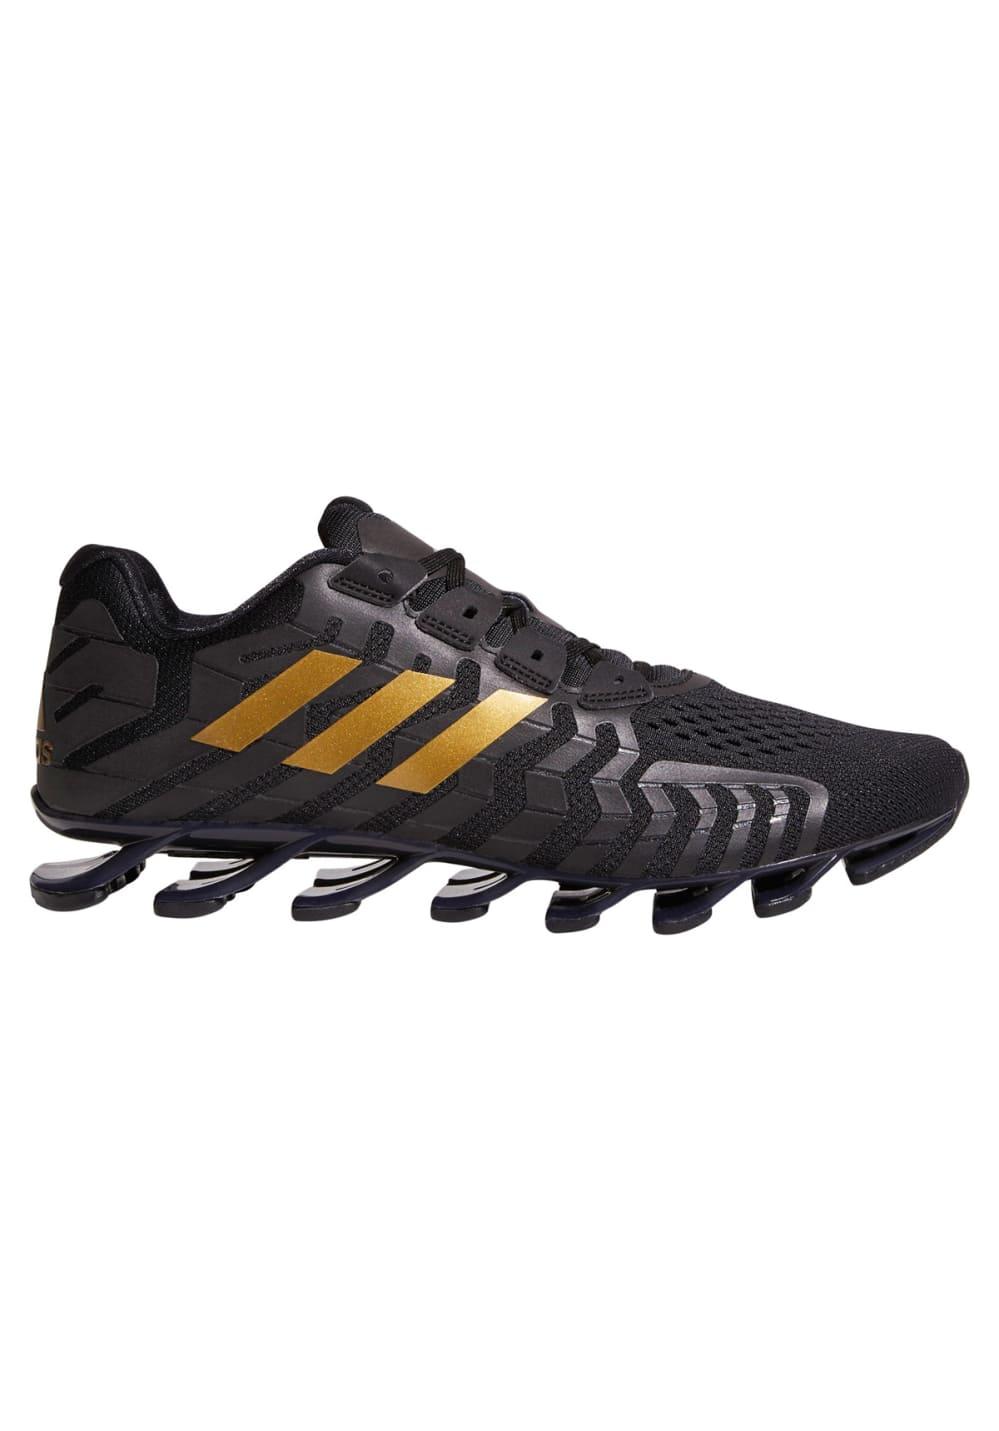 meilleures baskets 1f8e0 455da adidas Springblade Pro - Chaussures running pour Homme - Noir